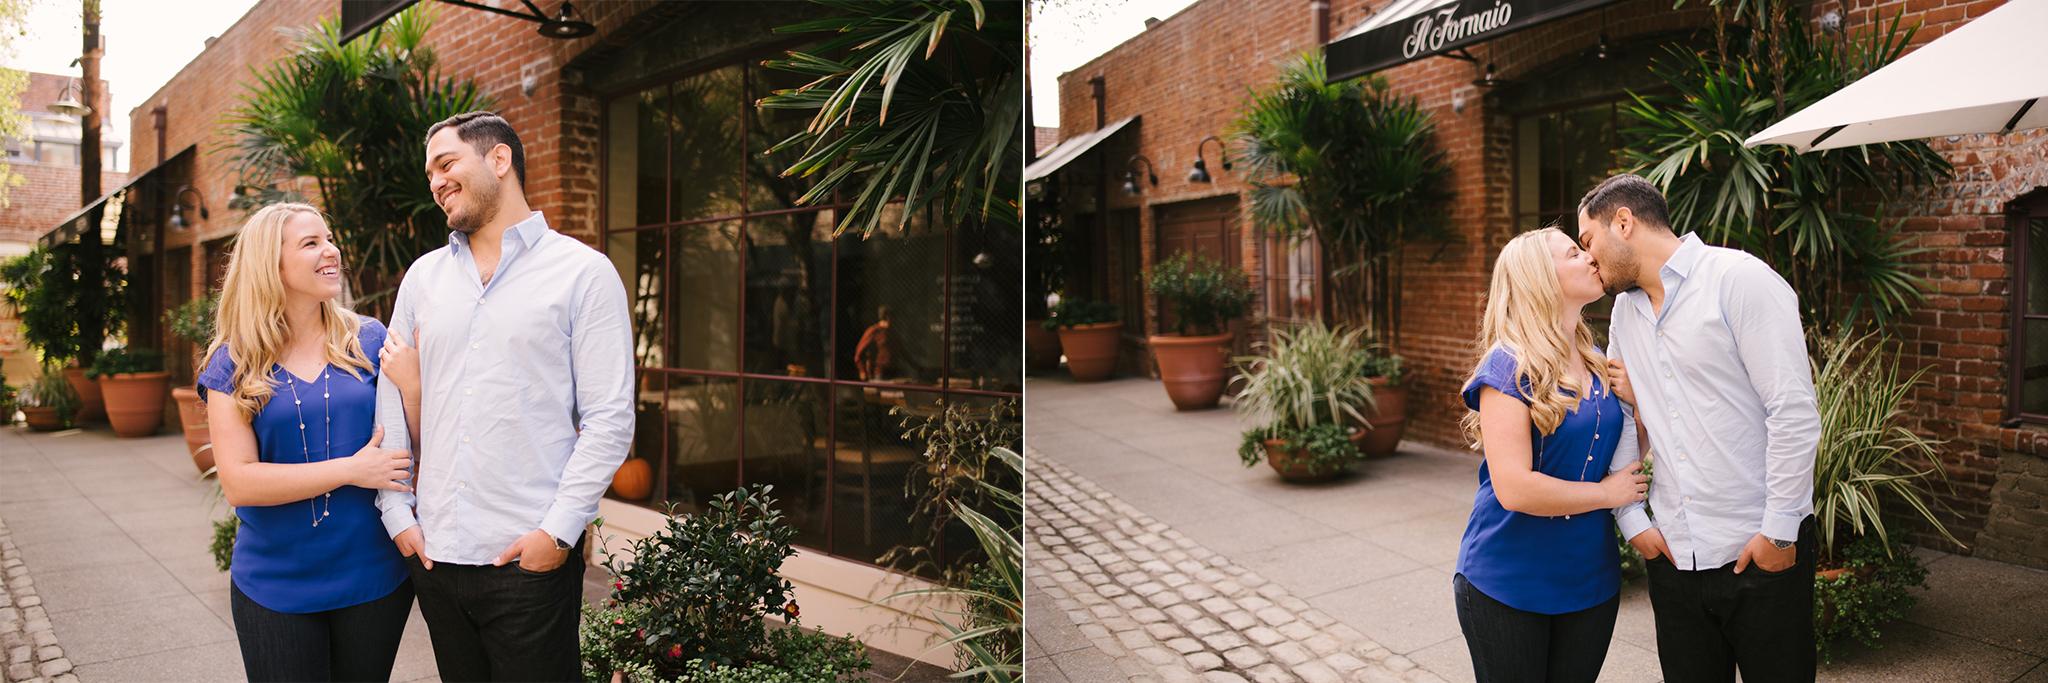 0002-JM-Pasadena-City-Hall-Los-Angeles-County-Engagement-Photography